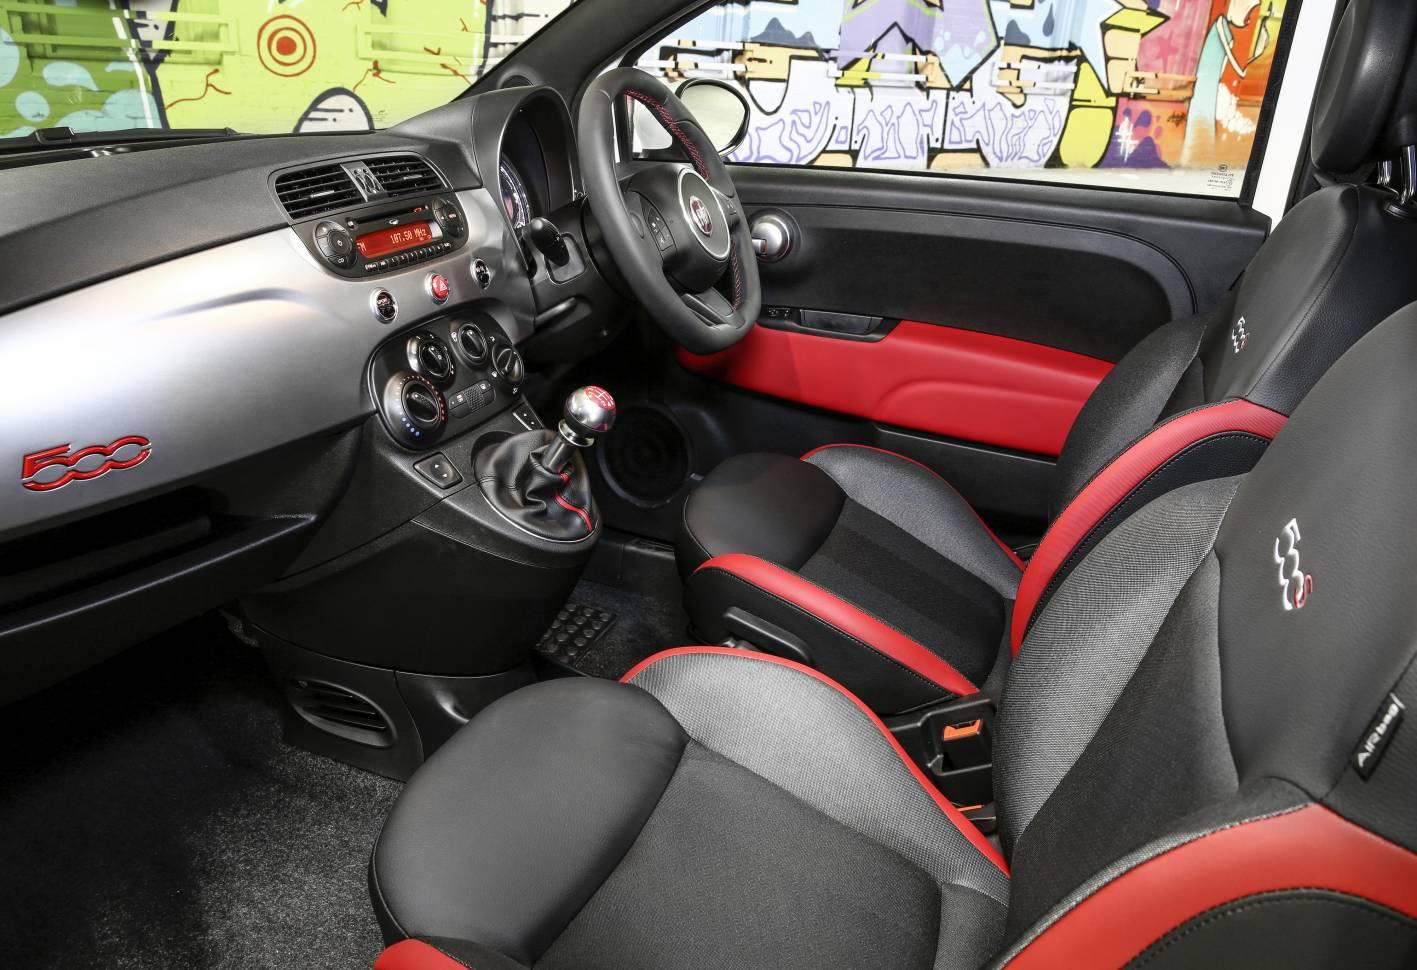 Fiat 500 Review 2014 Fiat 500 Pop